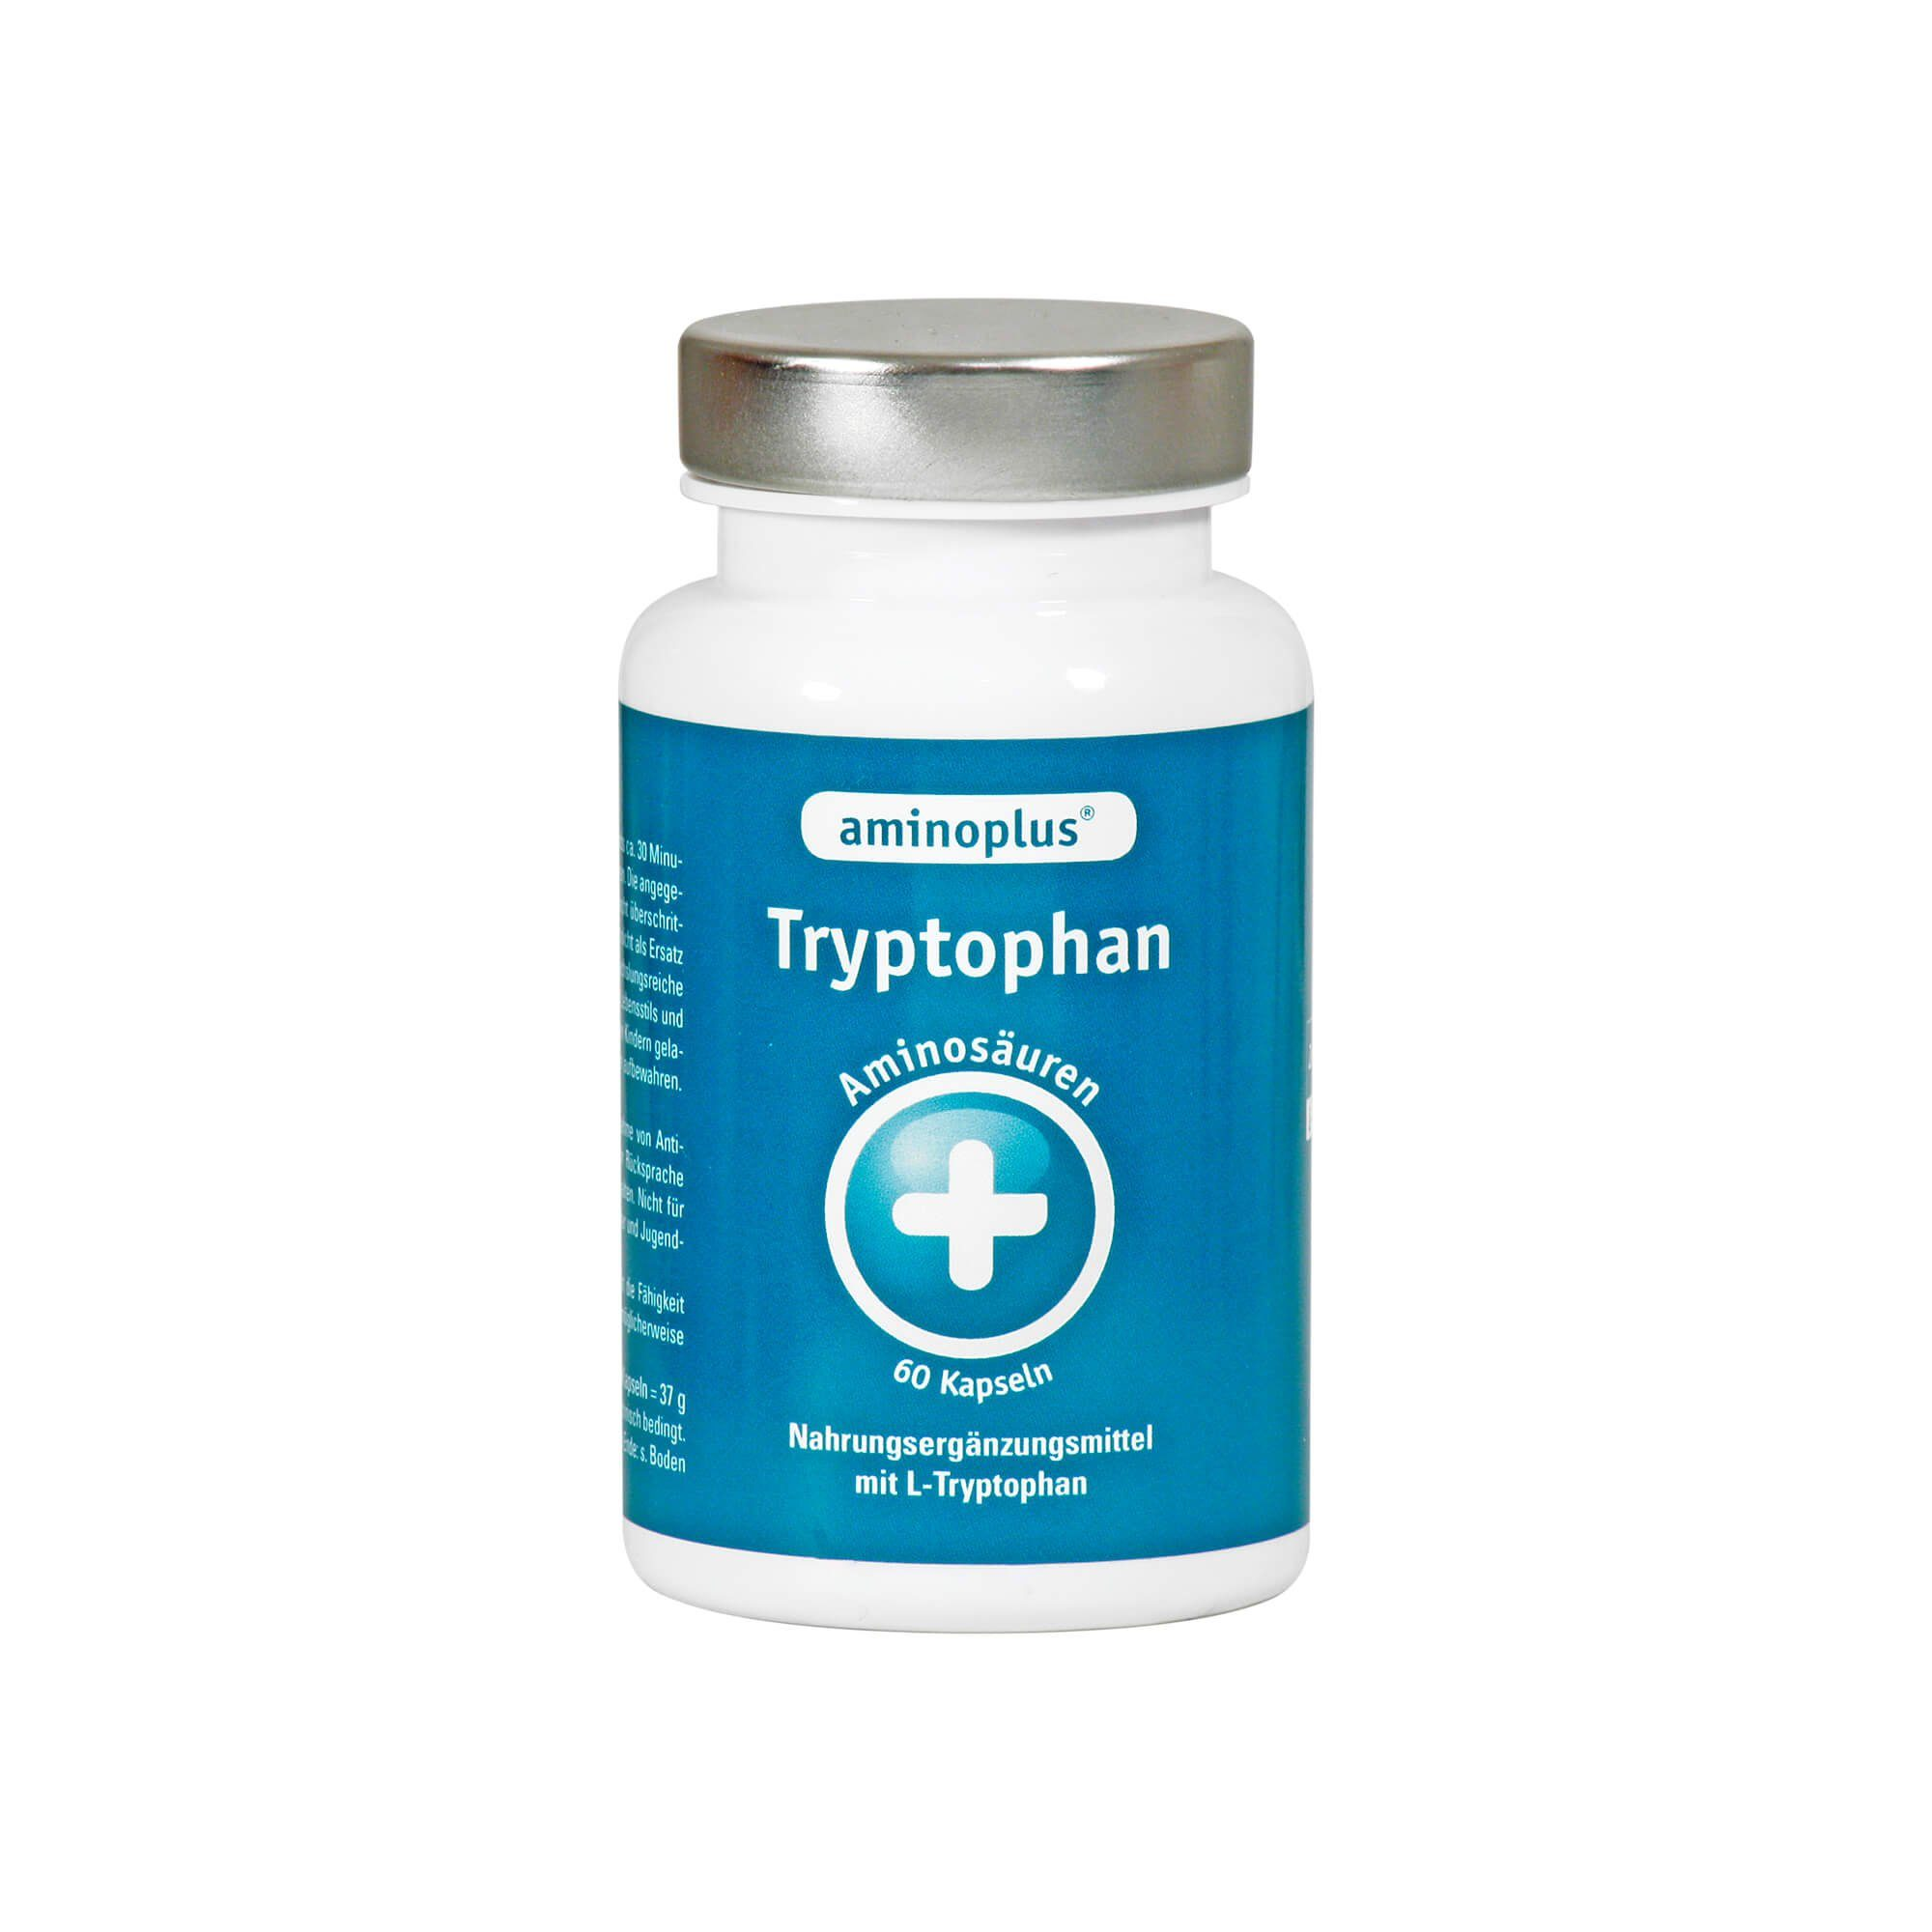 Aminoplus Tryptophan Kapseln , 60 St